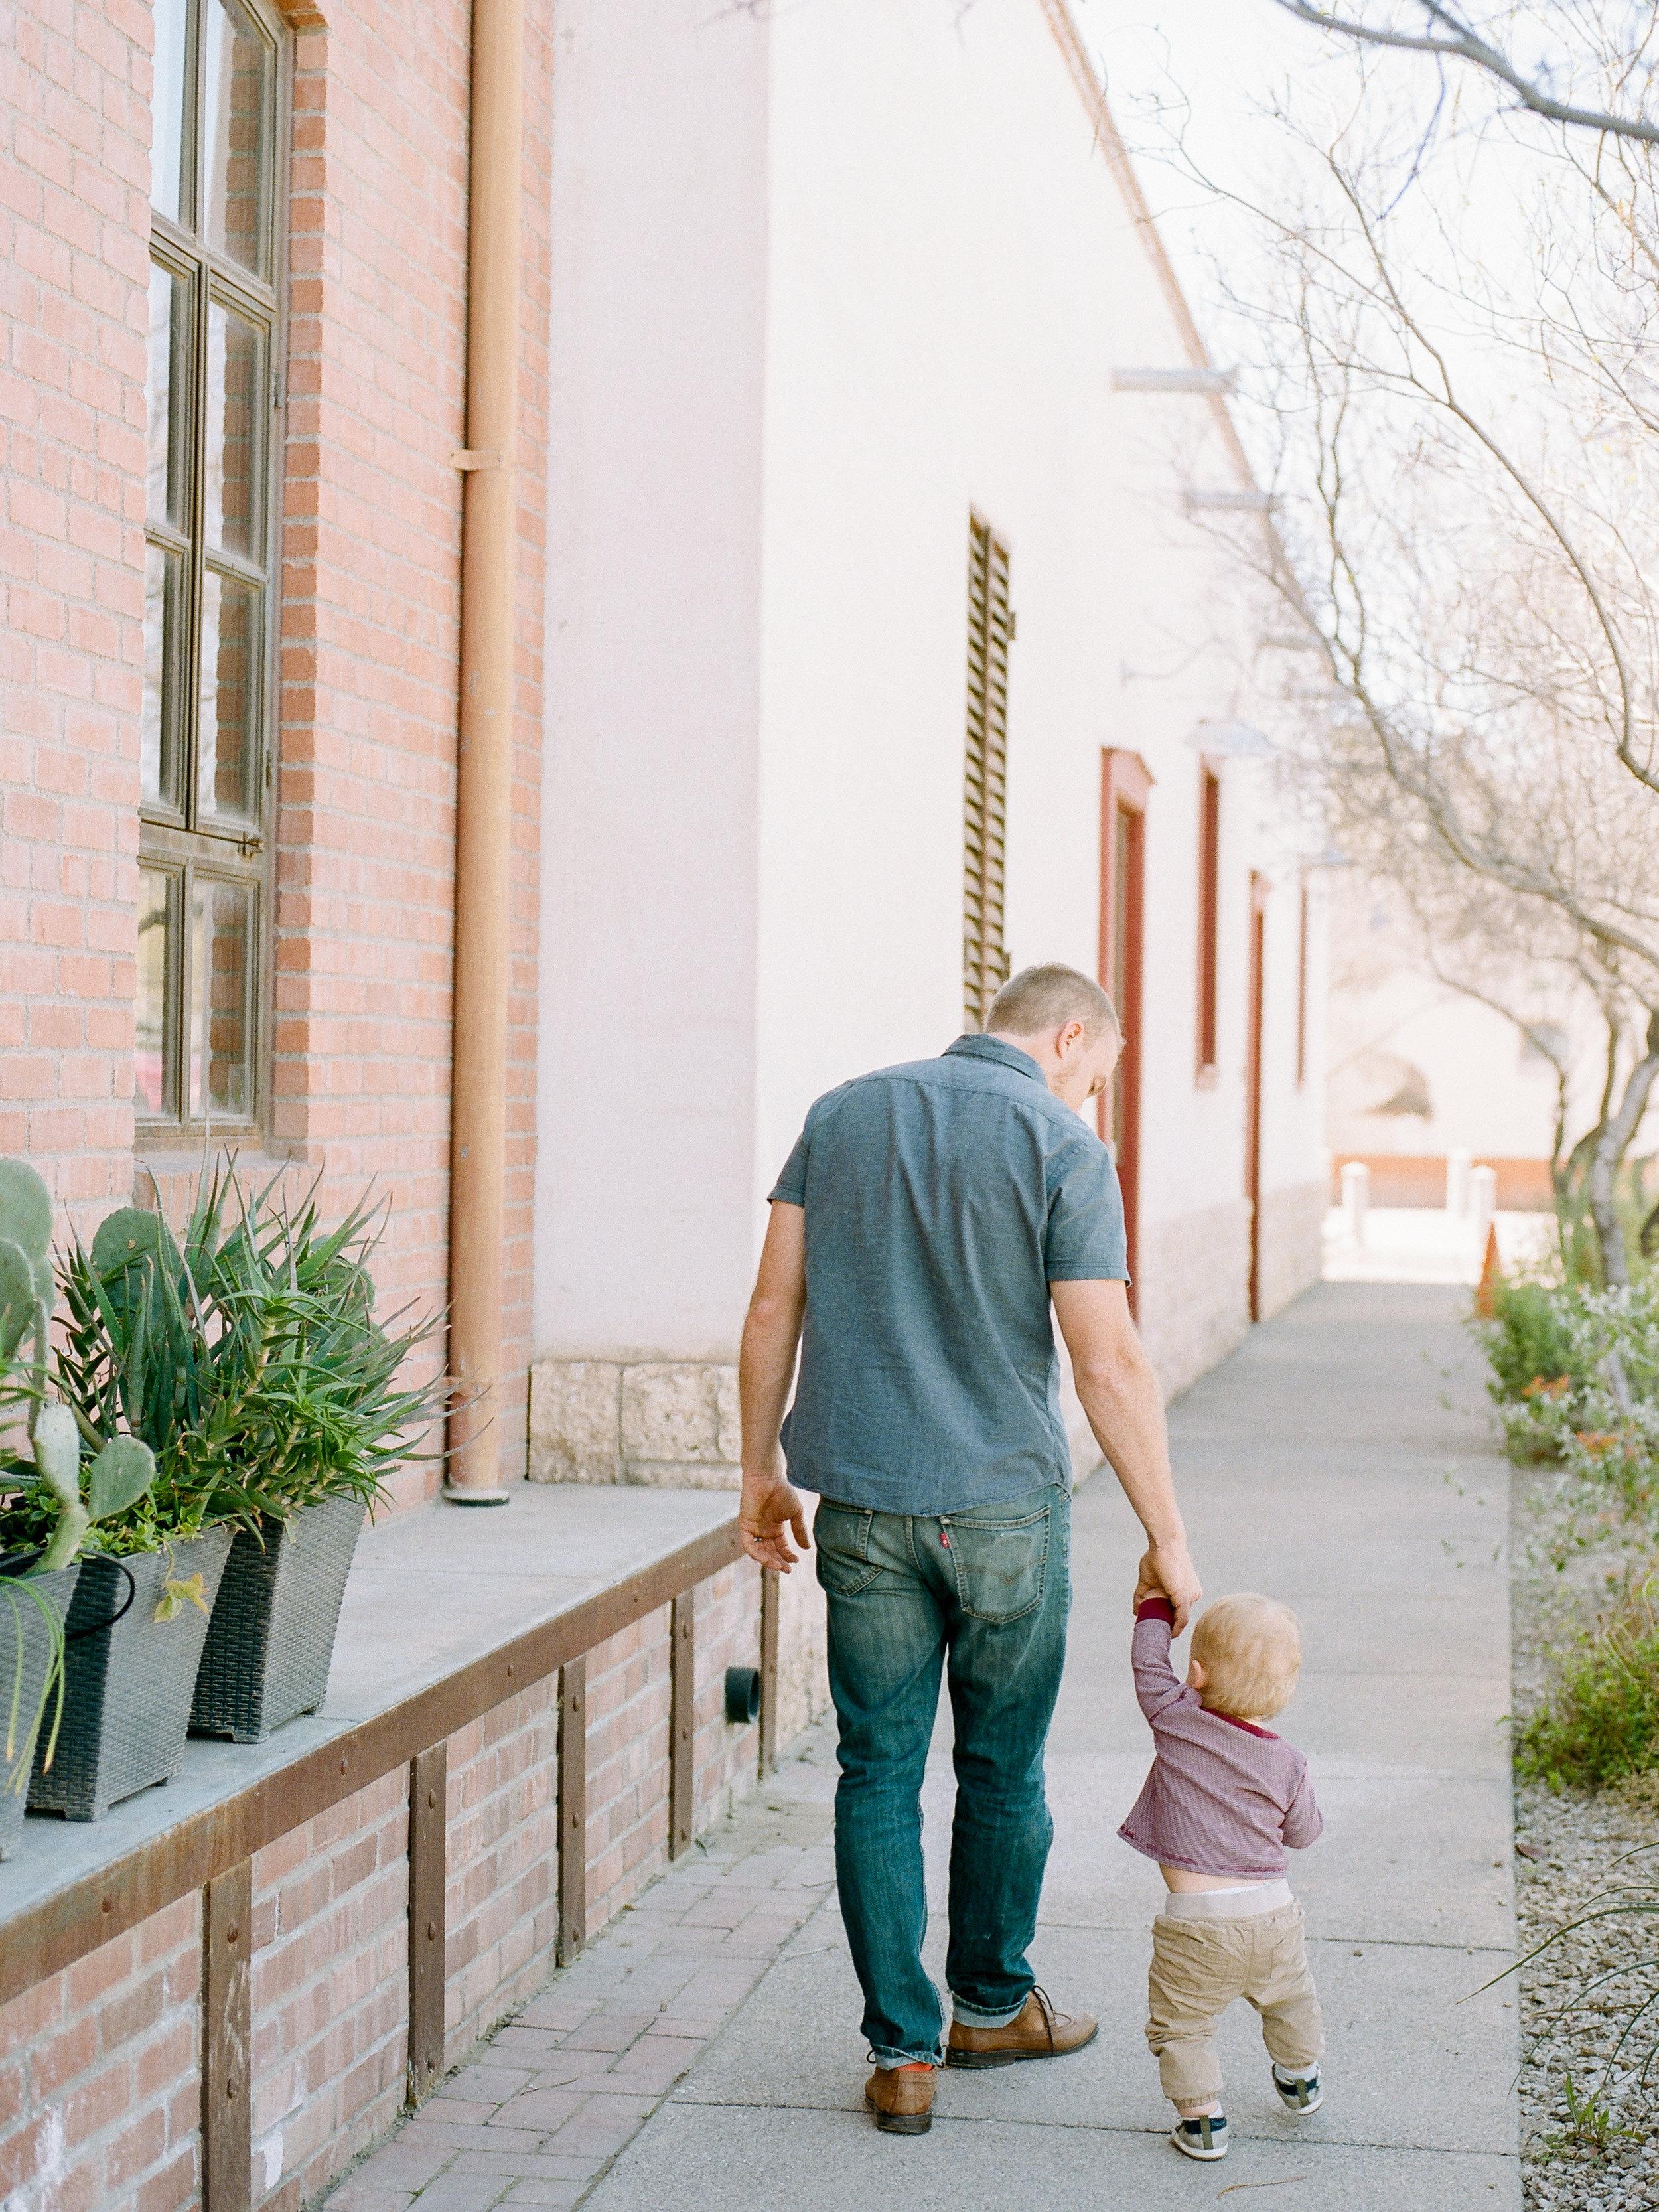 father-son-take-photos-together-in-arizona.jpg